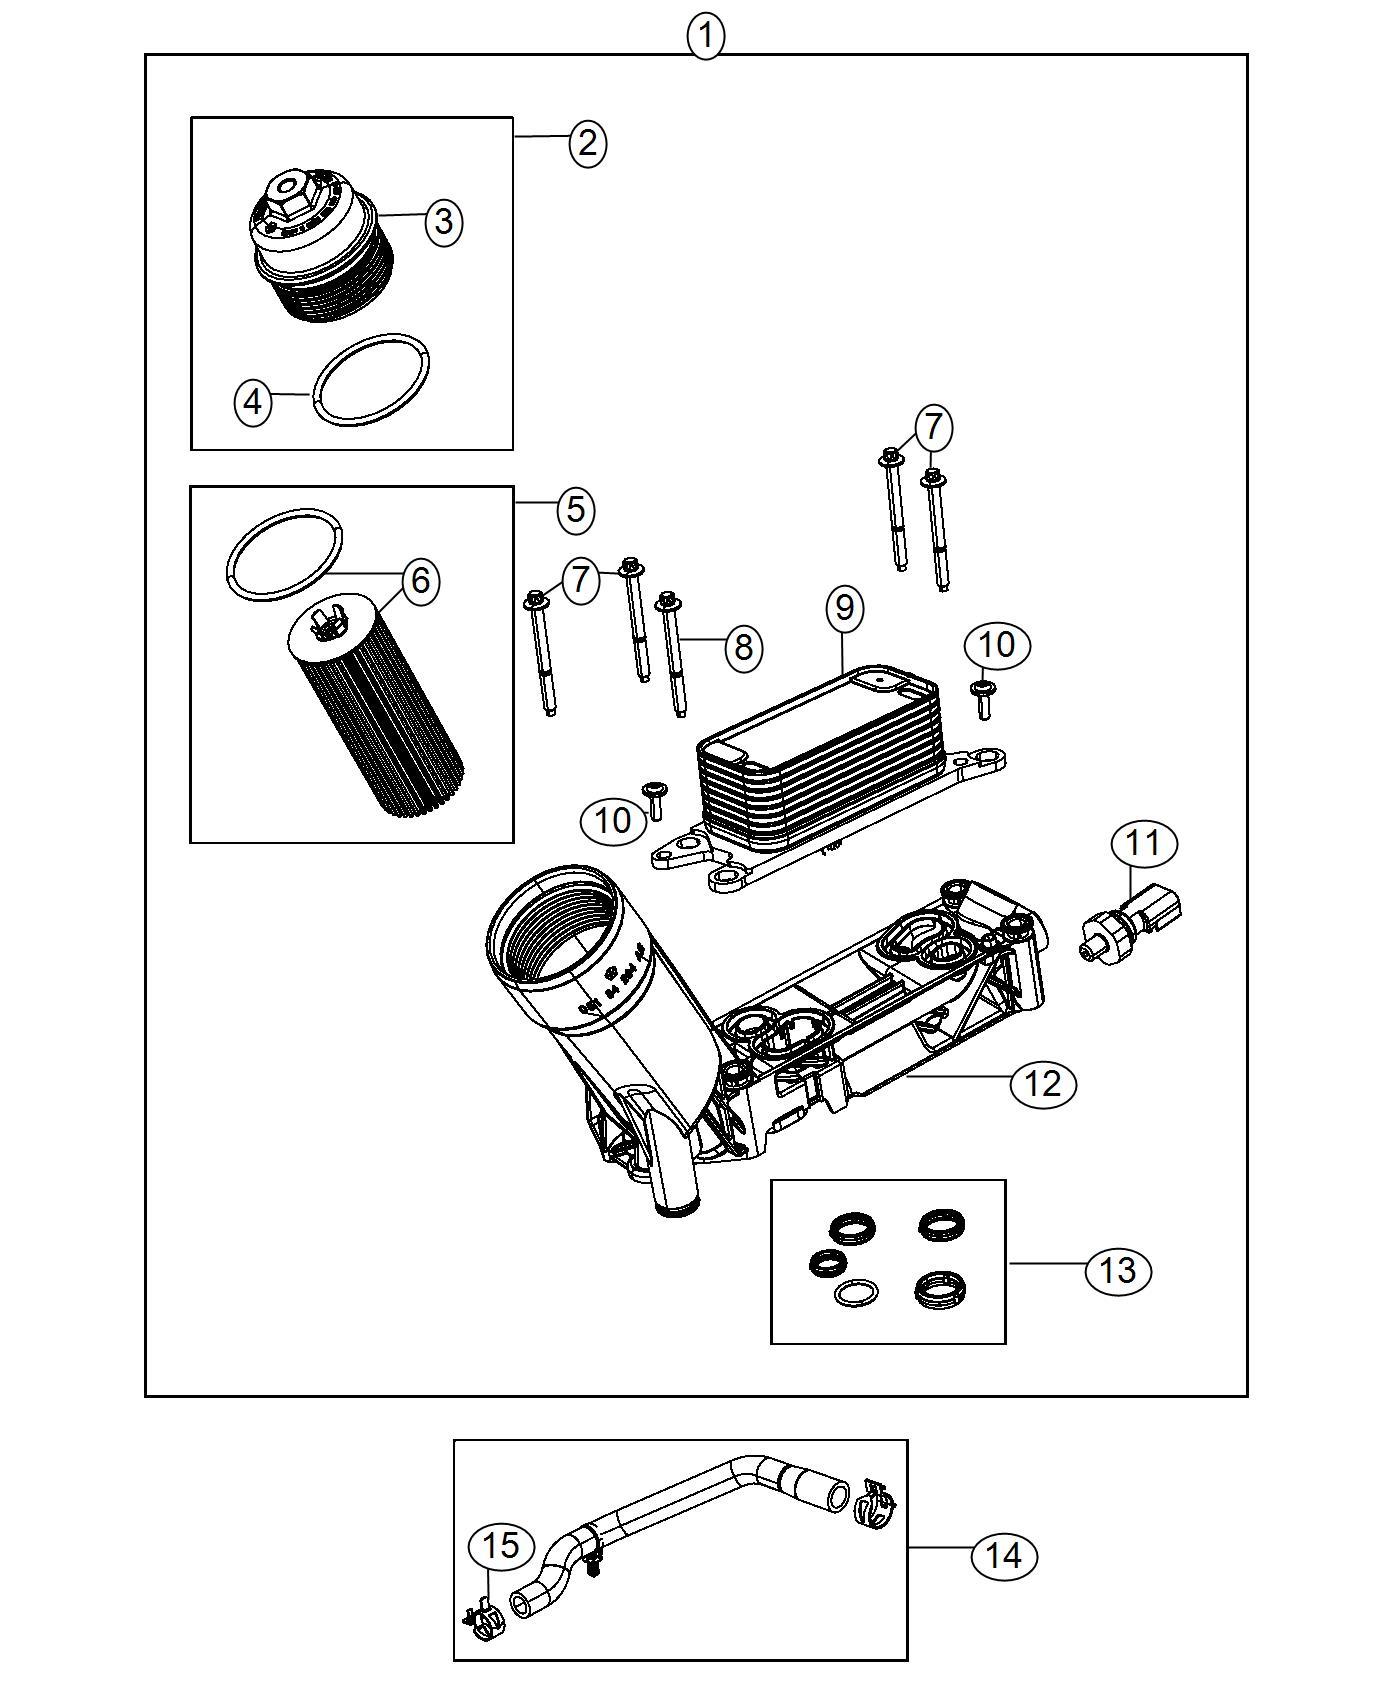 Chrysler 300 Hose Oil Cooler Outlet Includes Clamps Engine Adapter Filter